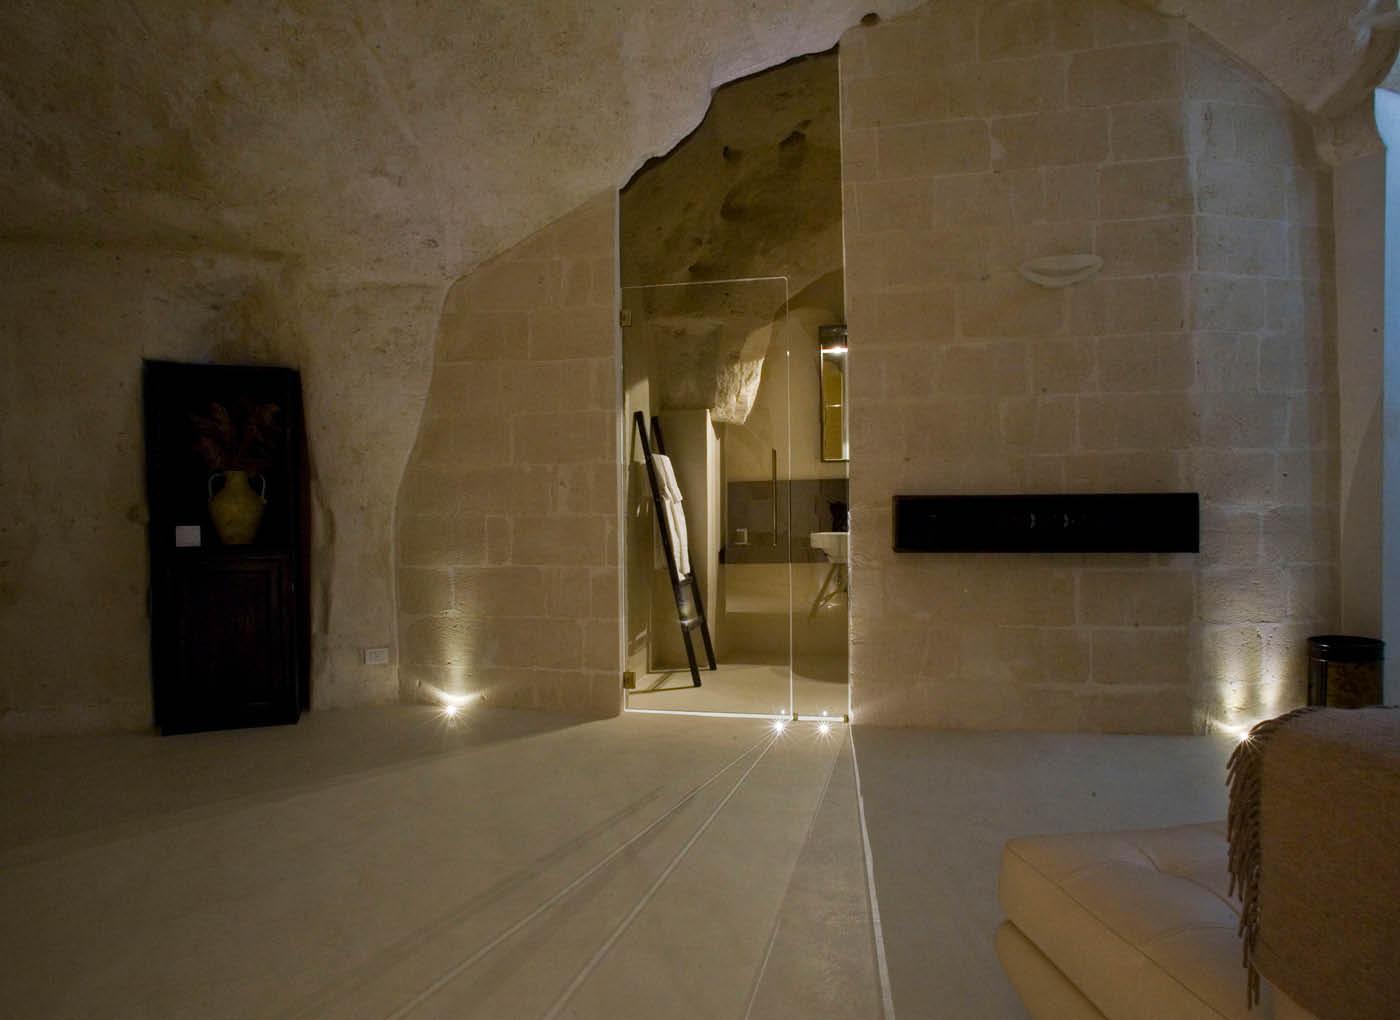 ristrutturazione-sant-angelo-luxury-resort-matera-paris-lecacls-13